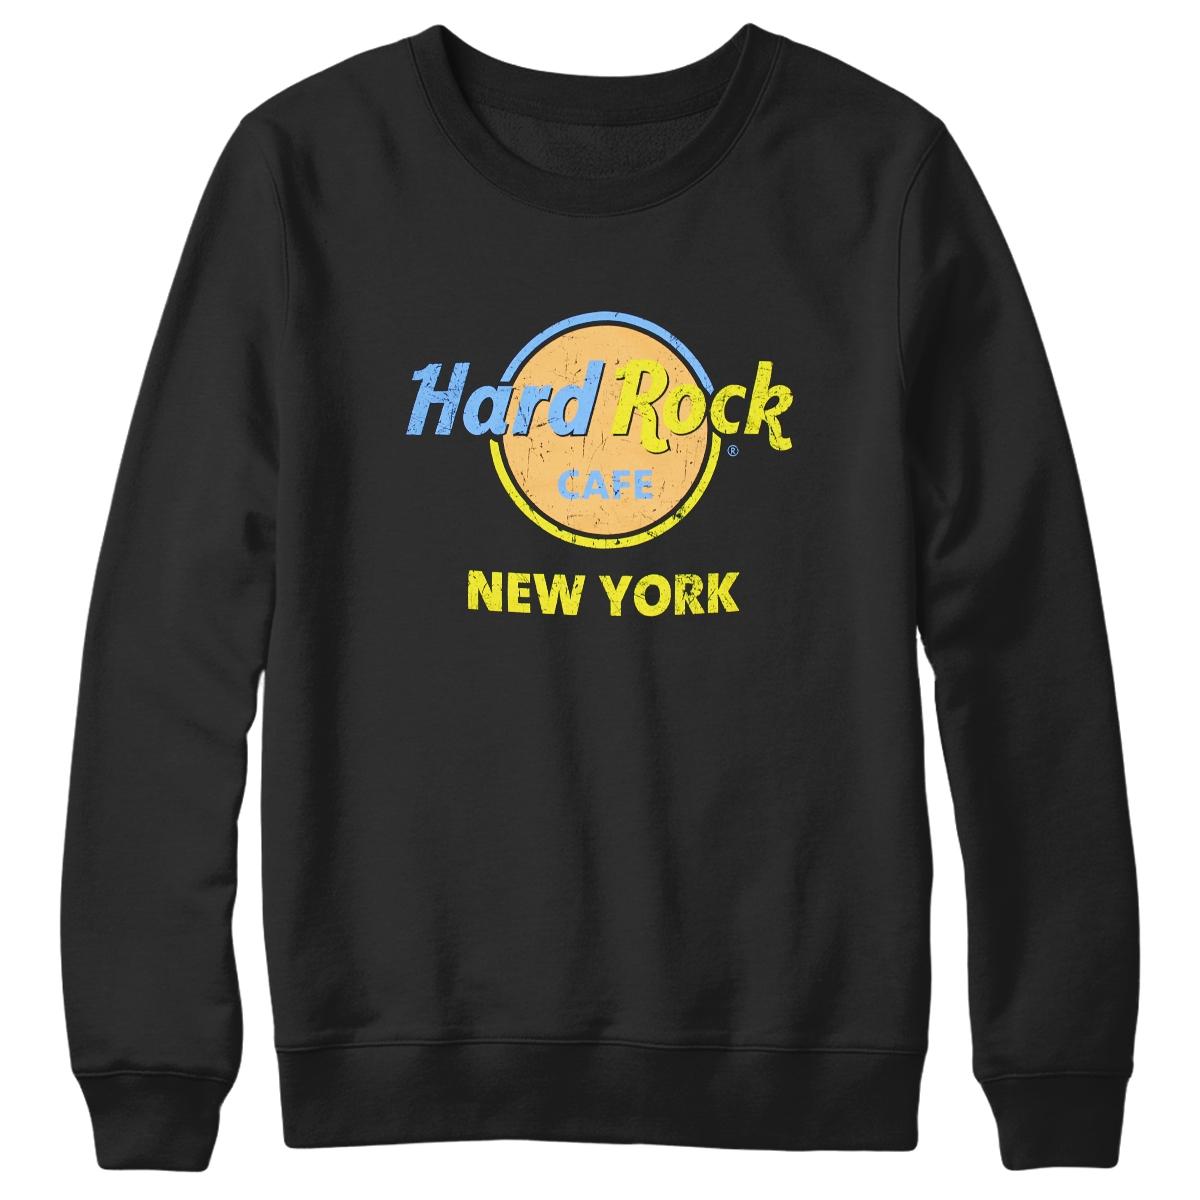 Throwback Logo Sweatshirt NYC 0